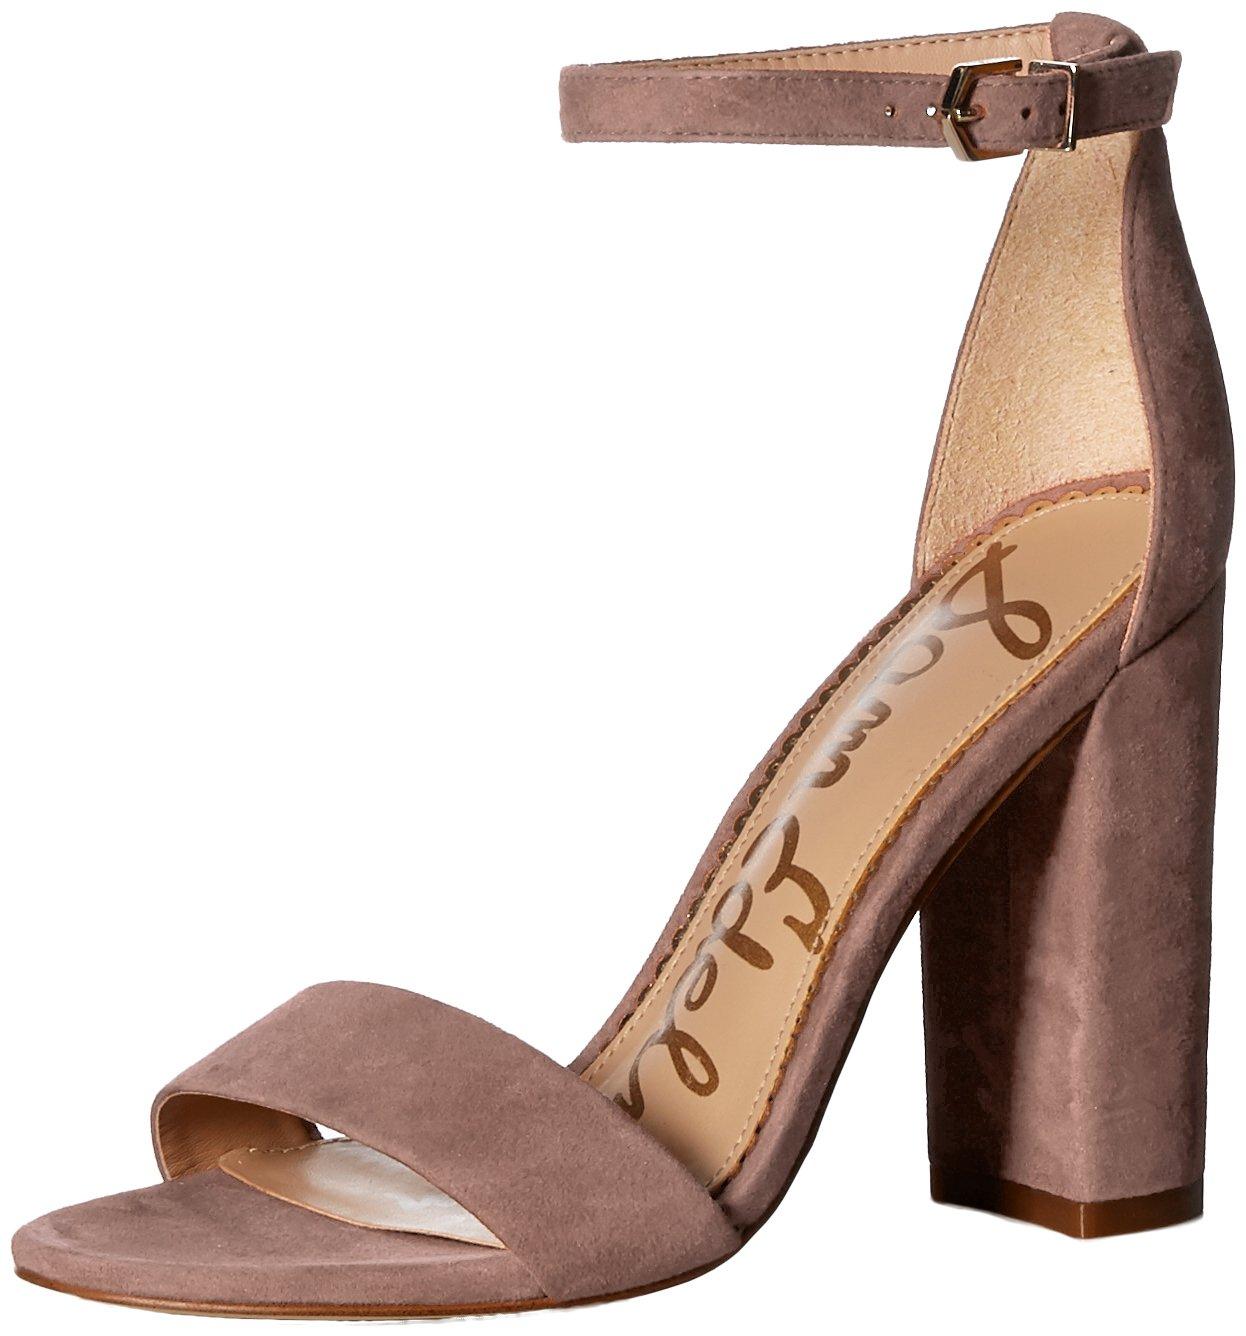 Sam Edelman Women's Yaro Heeled Sandal, Dusty Rose, 6 M US